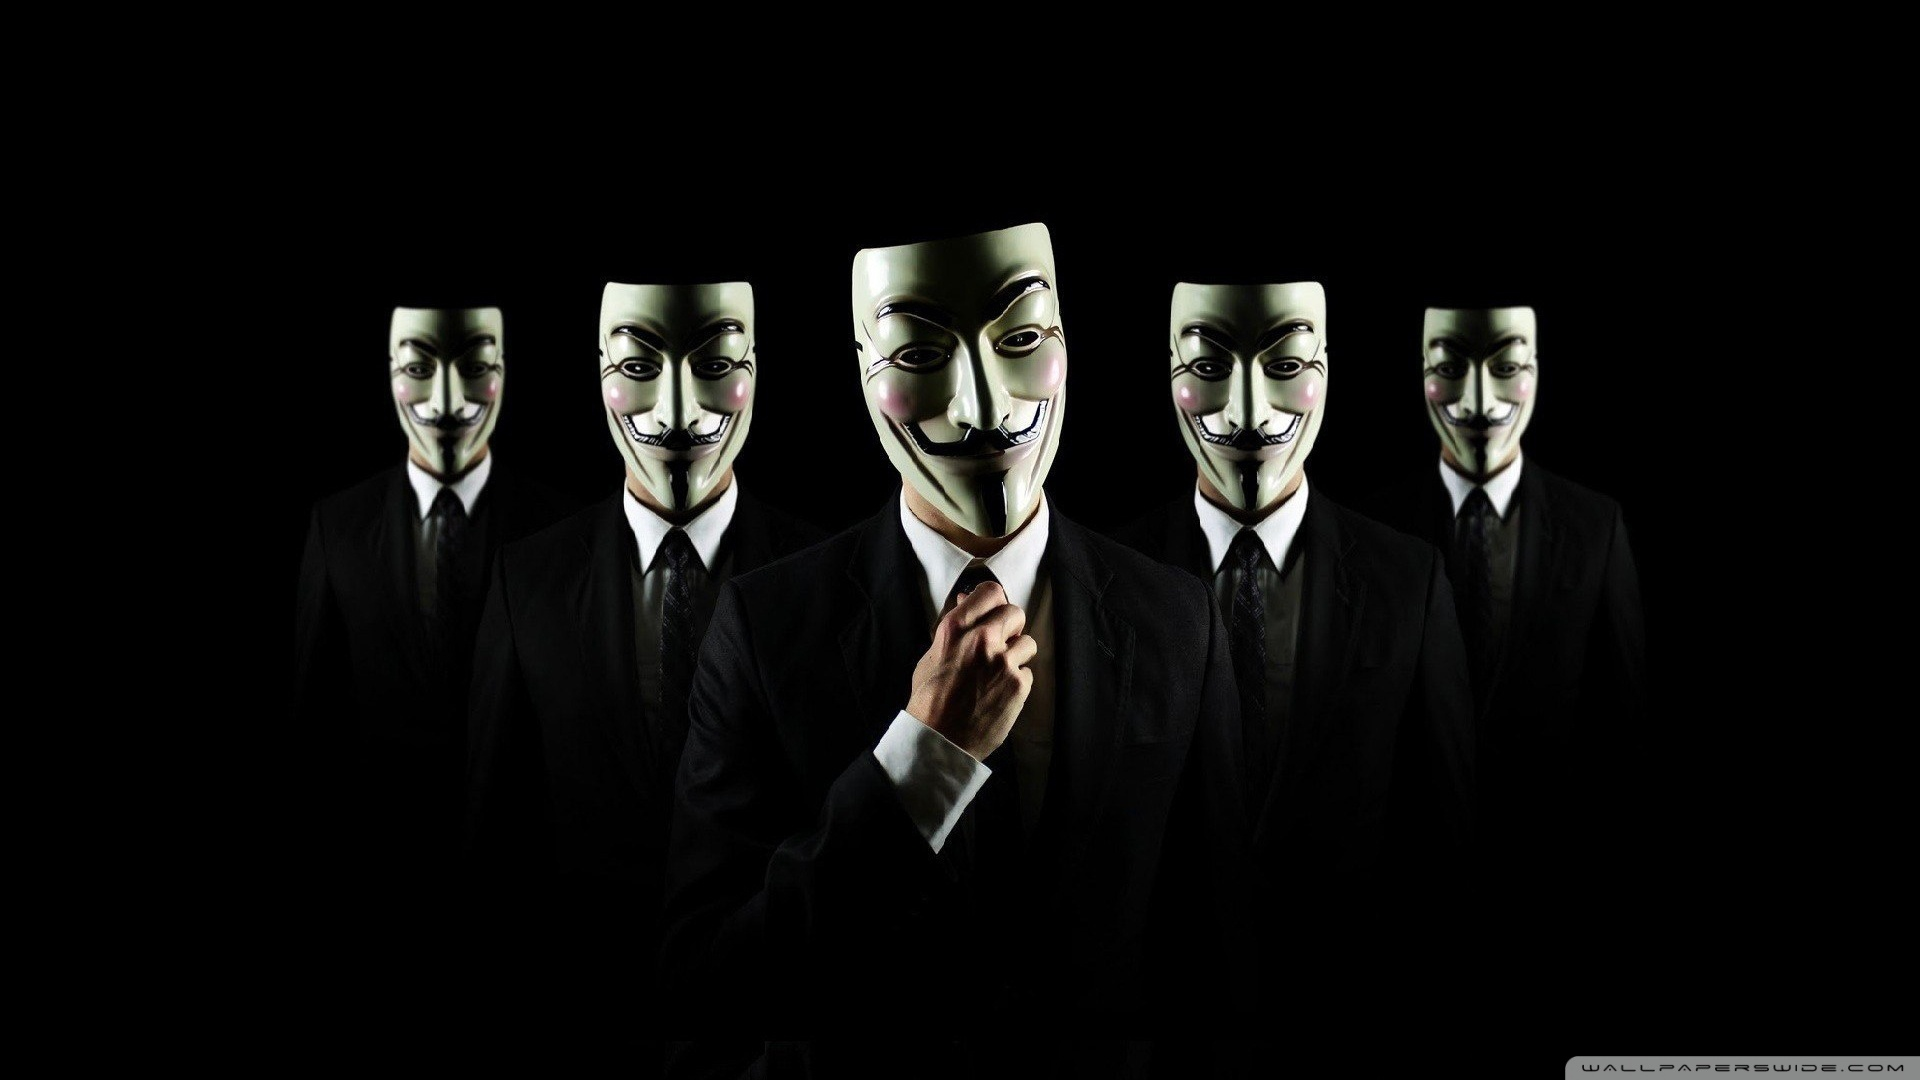 Anonymous Wallpaper HD 1920x1080 ImageBankbiz 1920x1080